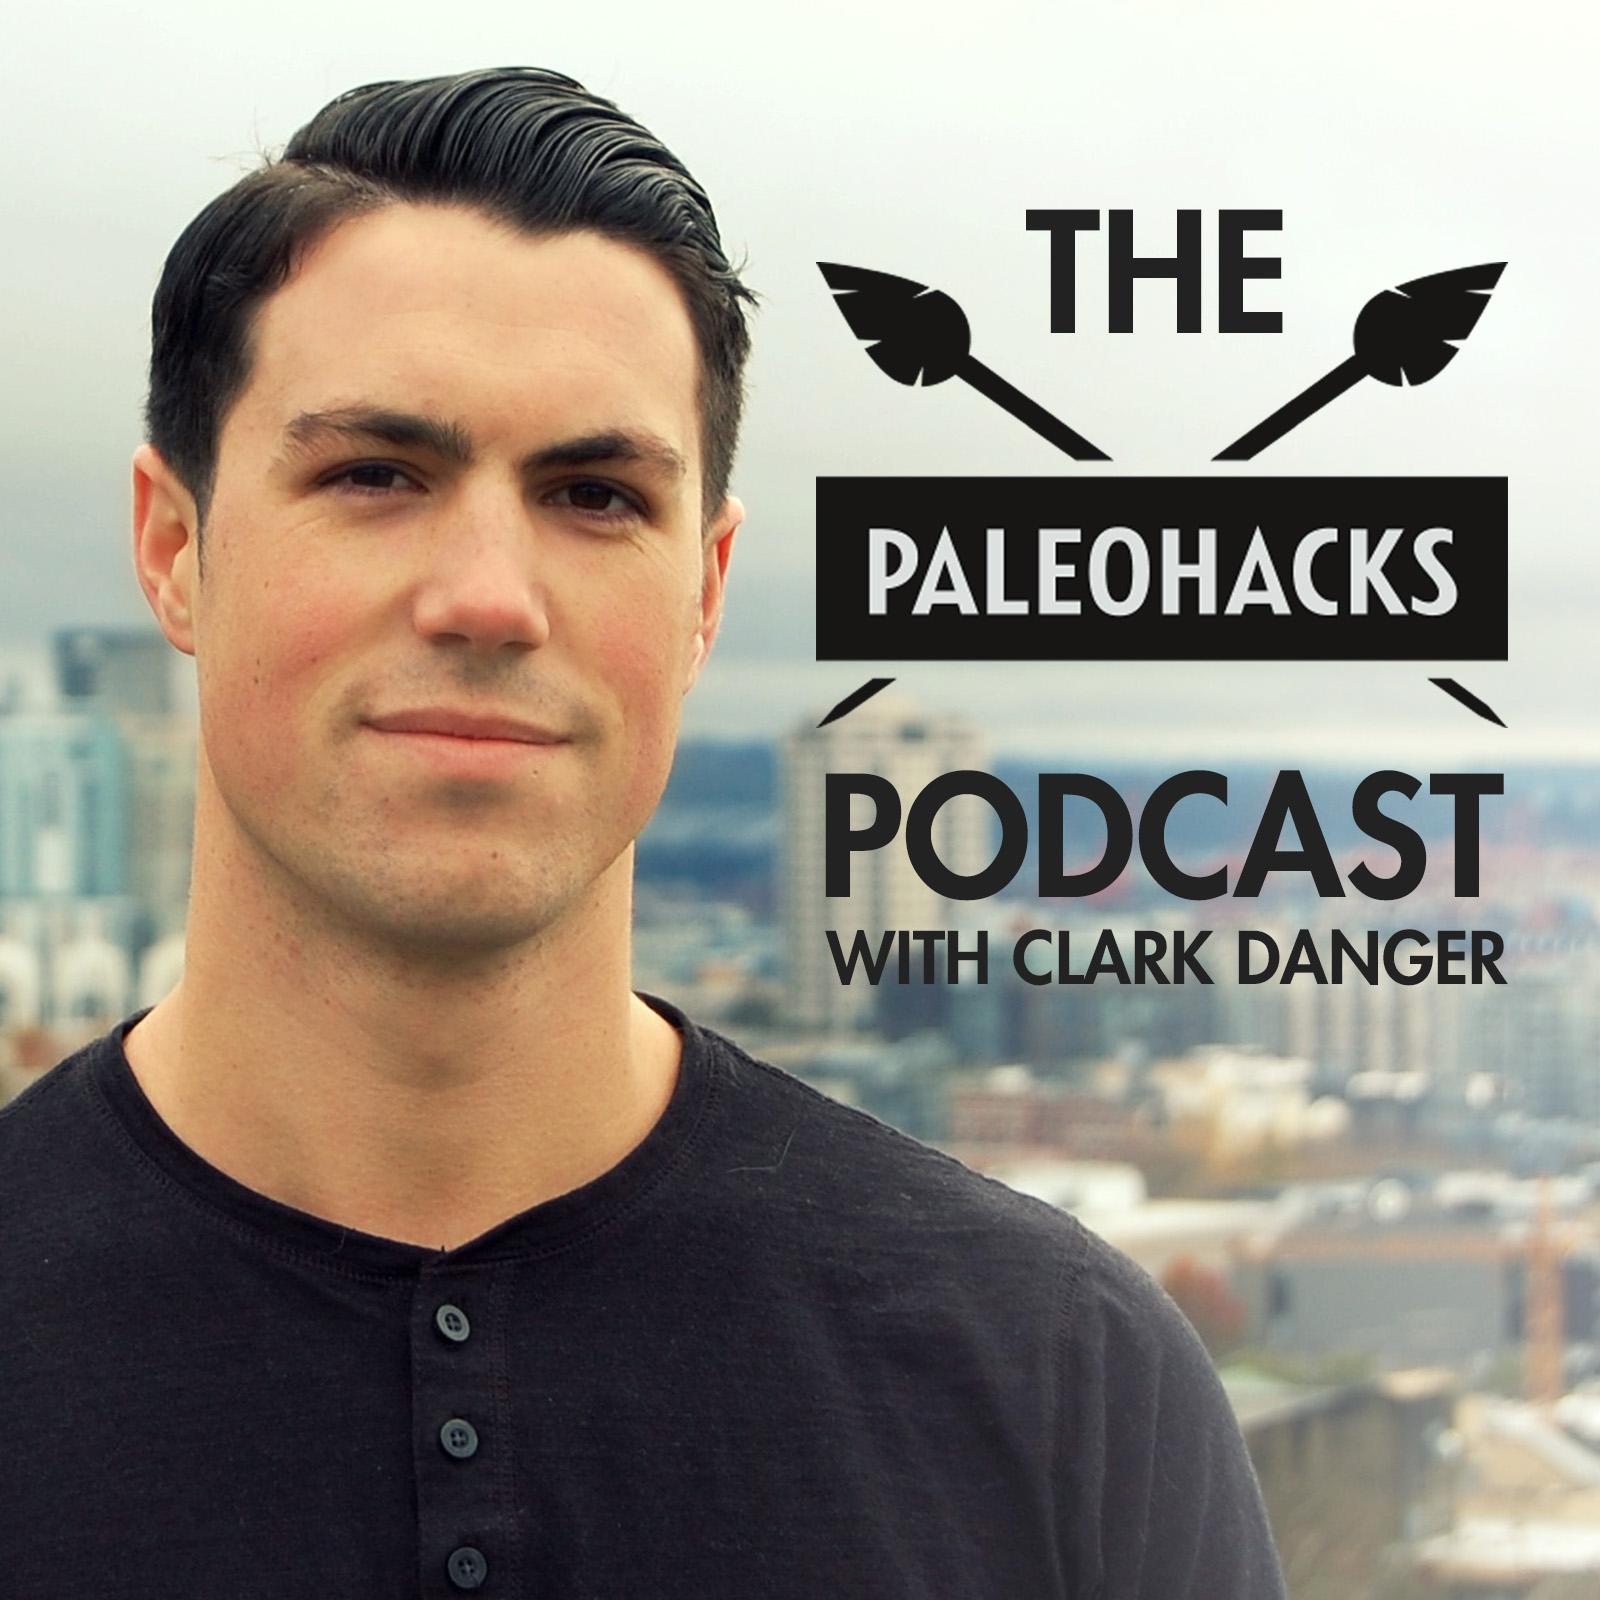 The Paleohacks Podcast – Paleo Blog